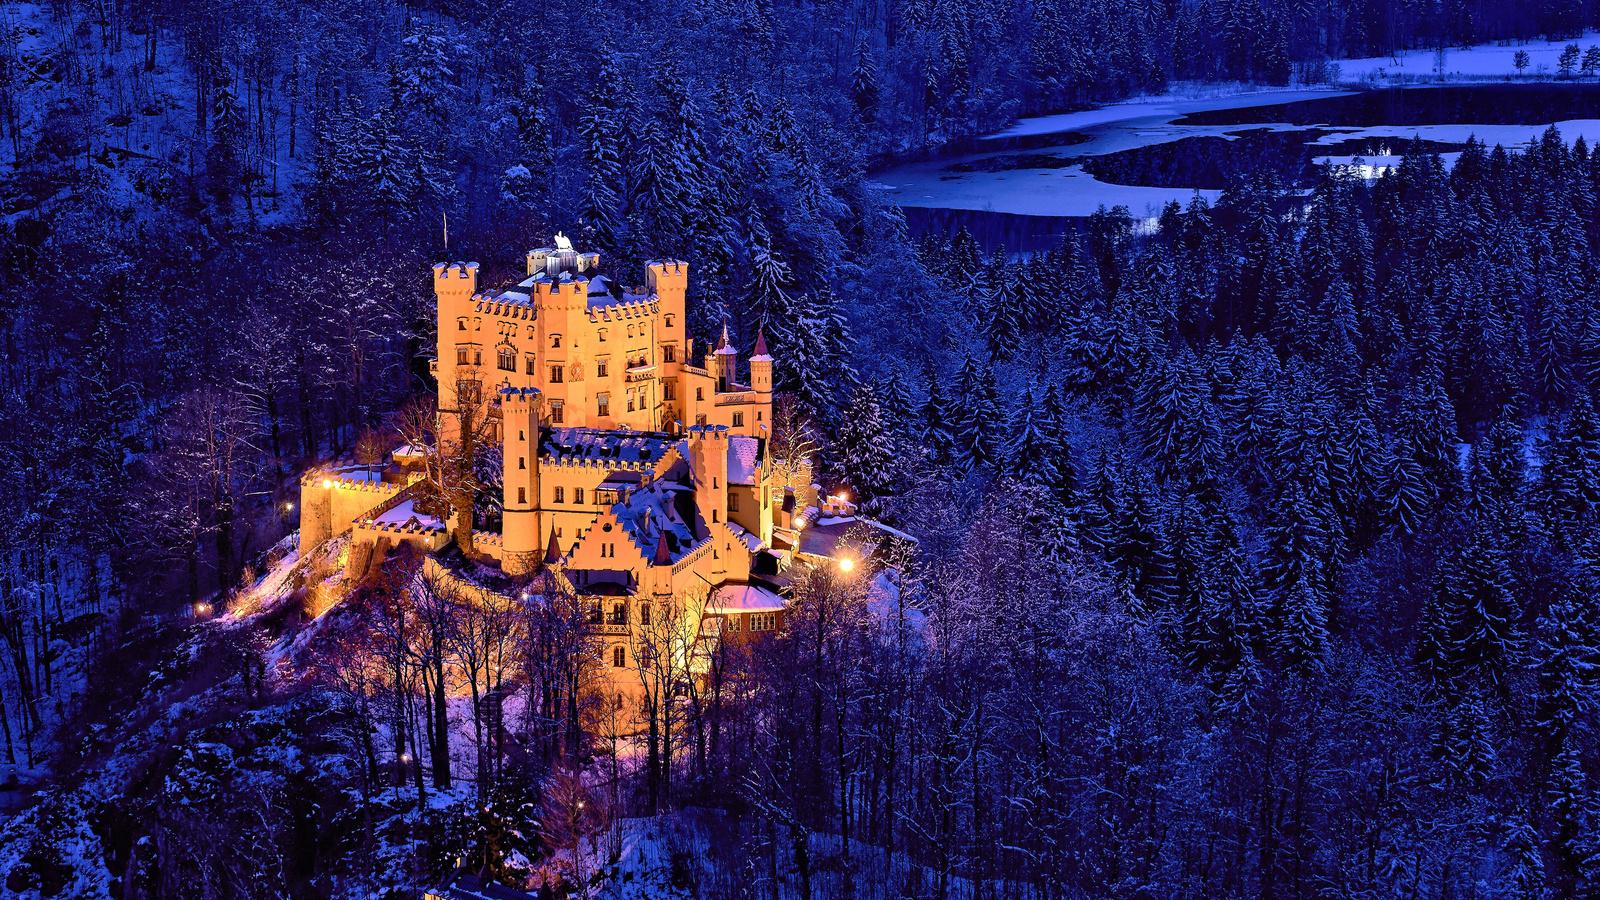 hohenschwangau castle, bavaria, germany, замок хоэншвангау, бавария, германия, замок, лес, деревья, зима